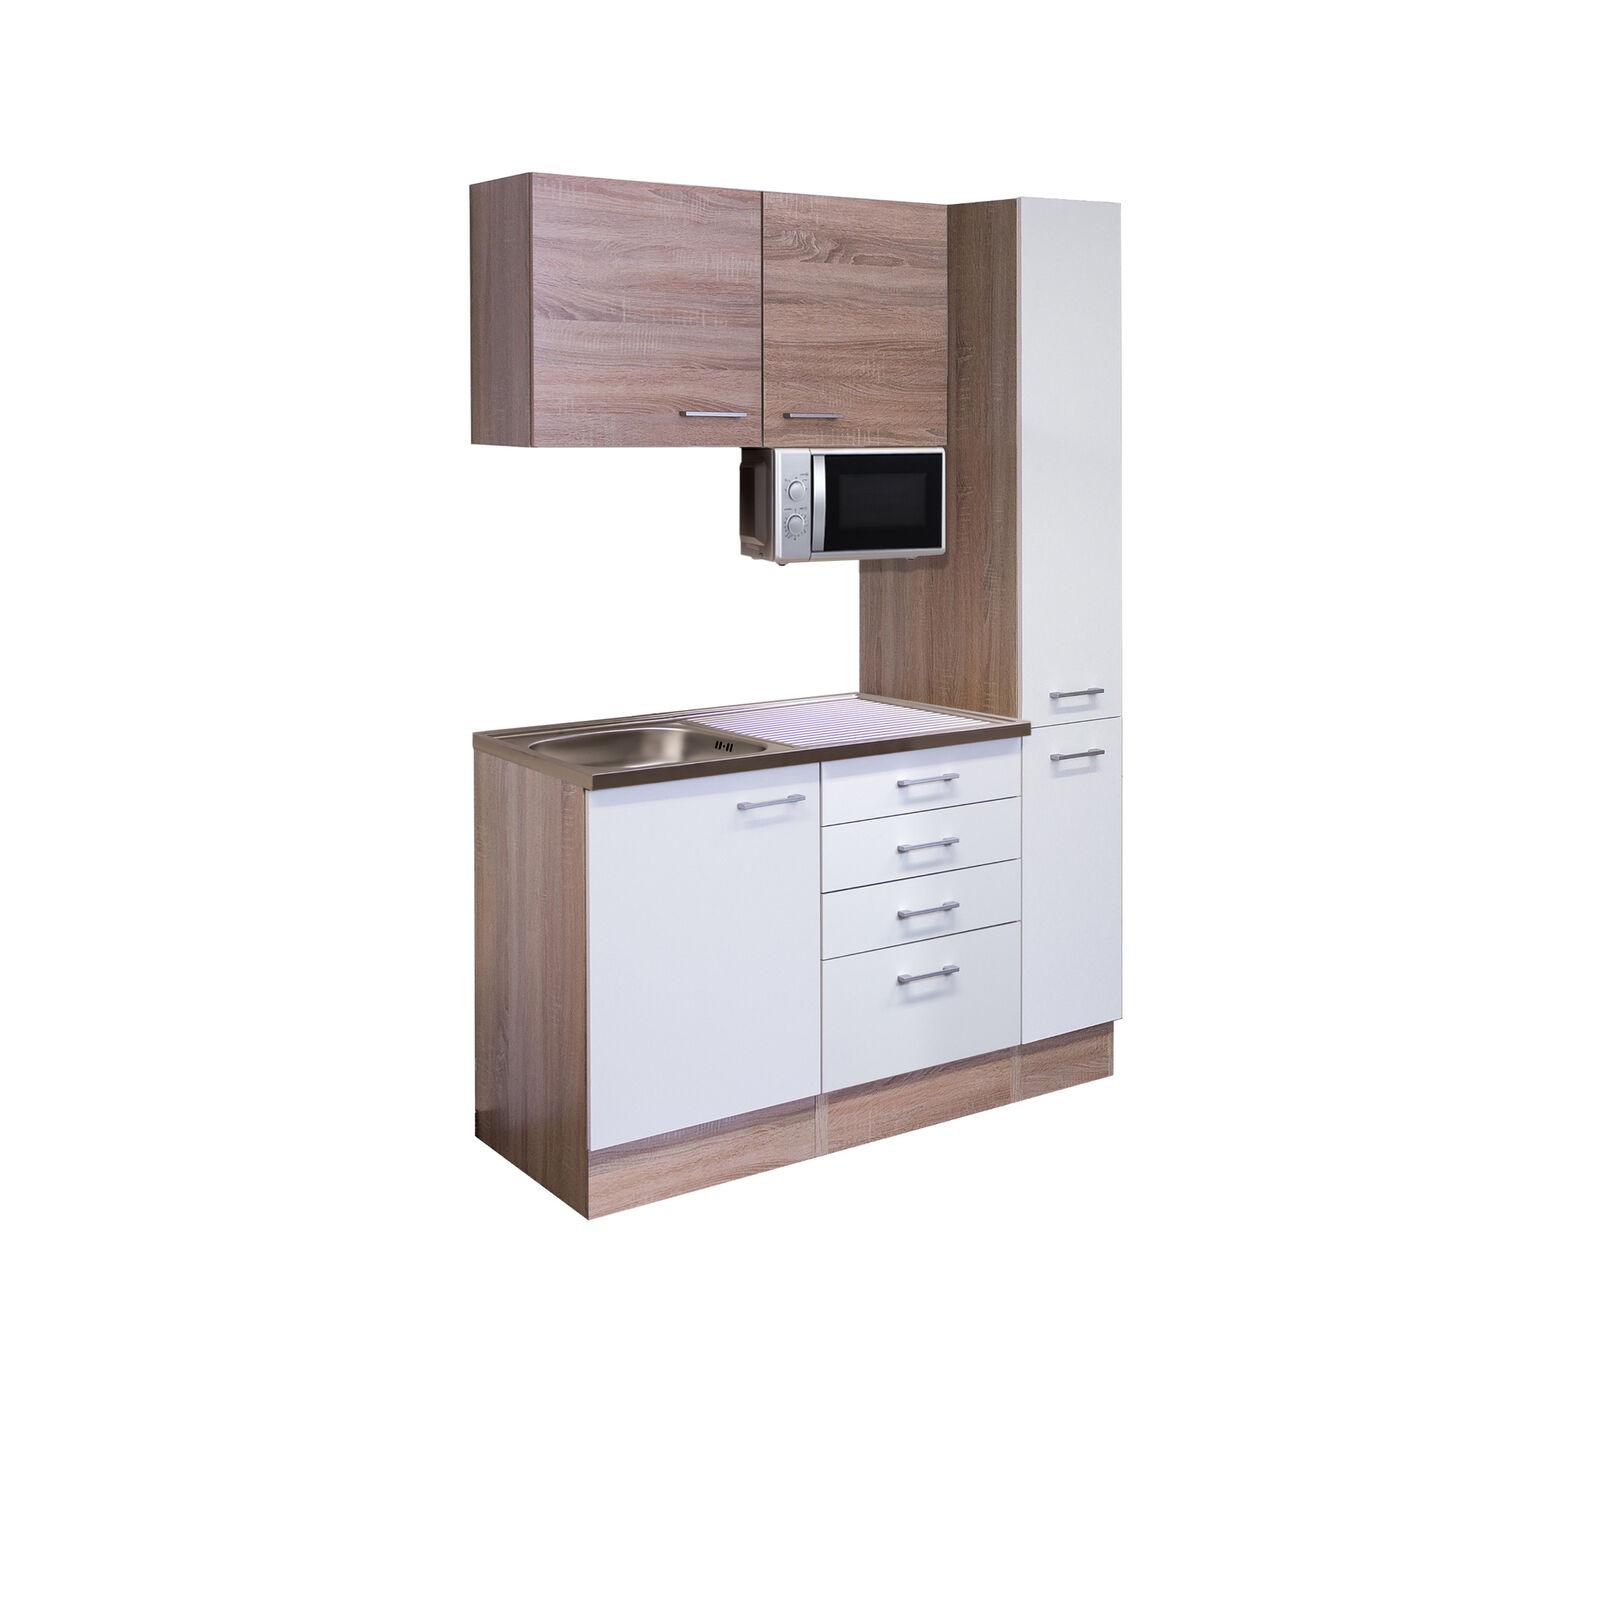 Büroküche Teeküche Miniküche Singleküche Singleküche Singleküche mit Spüle Mikrowelle Küche 130 cm weiss 72d2a3